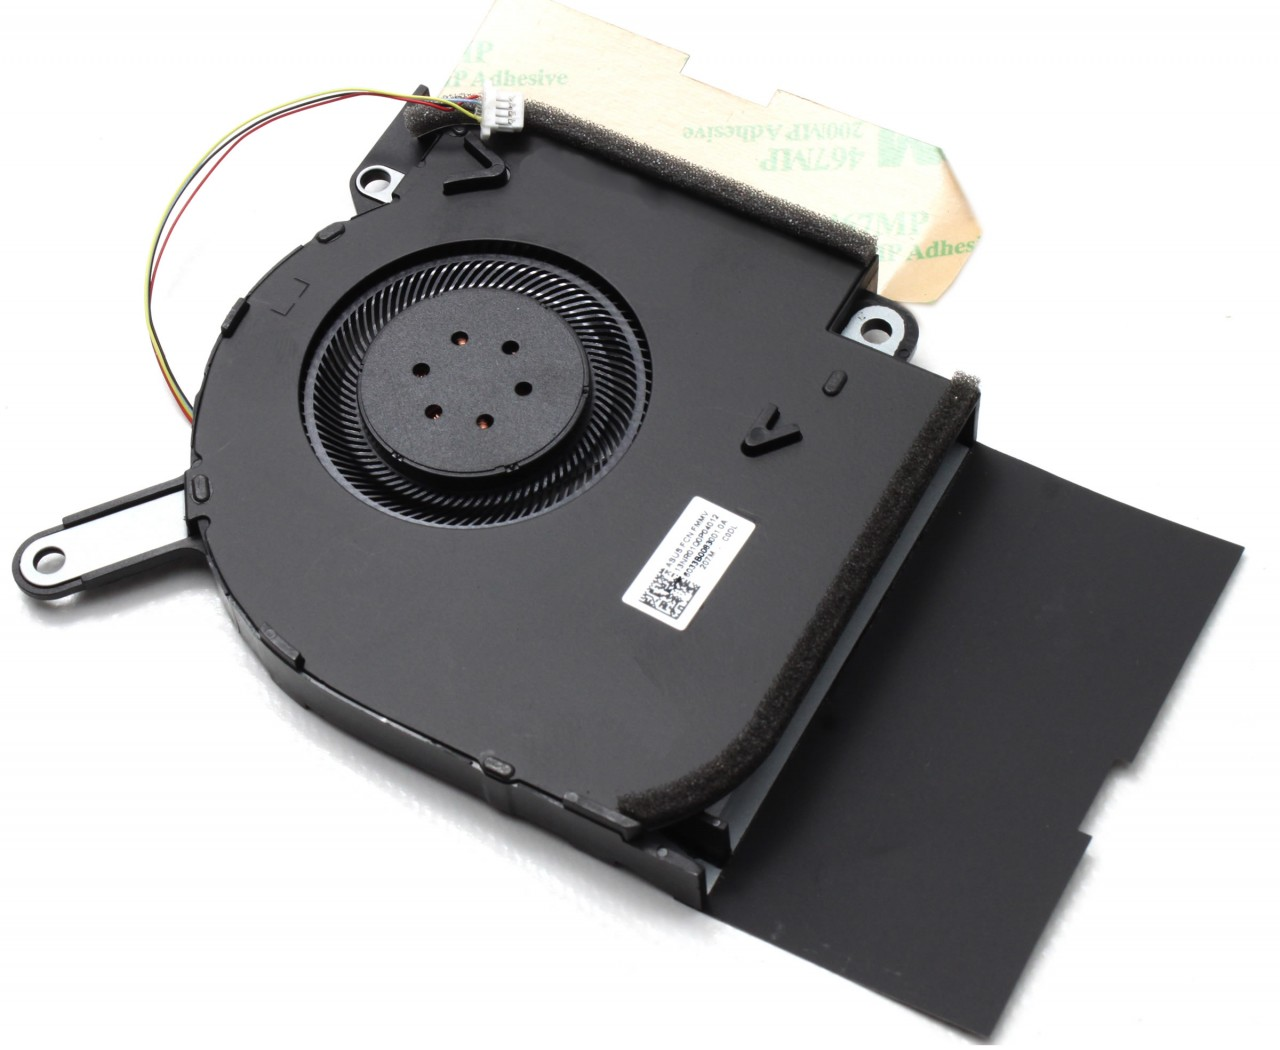 Cooler placa video laptop GPU Asus ROG Strix G731GV 12V imagine powerlaptop.ro 2021